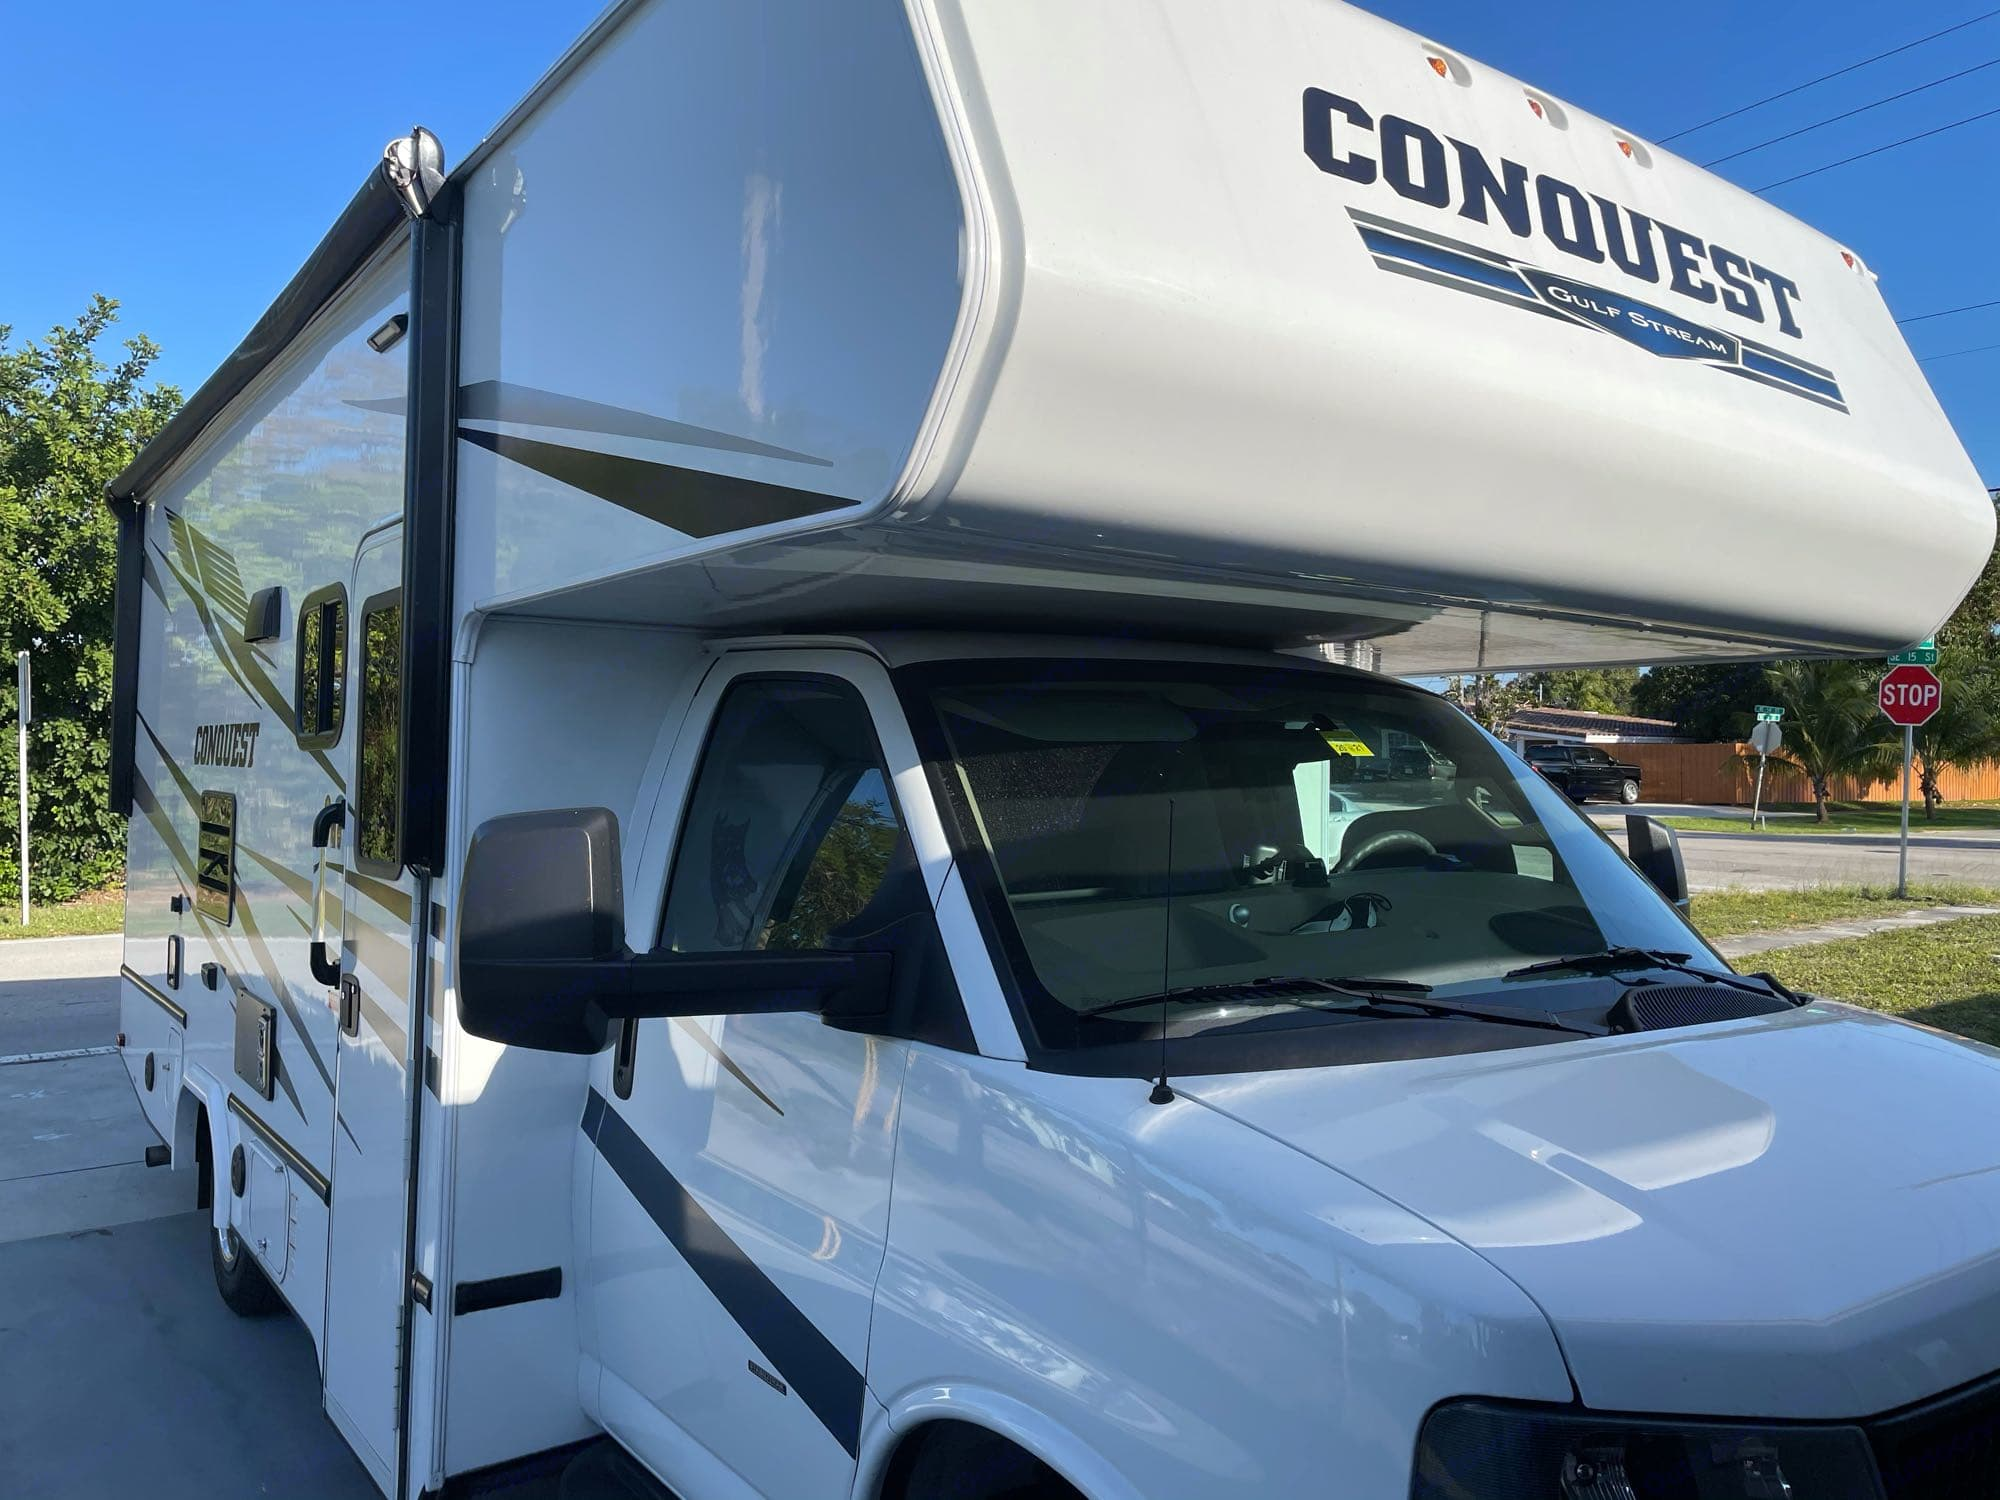 Chevrolet Conquest 2021